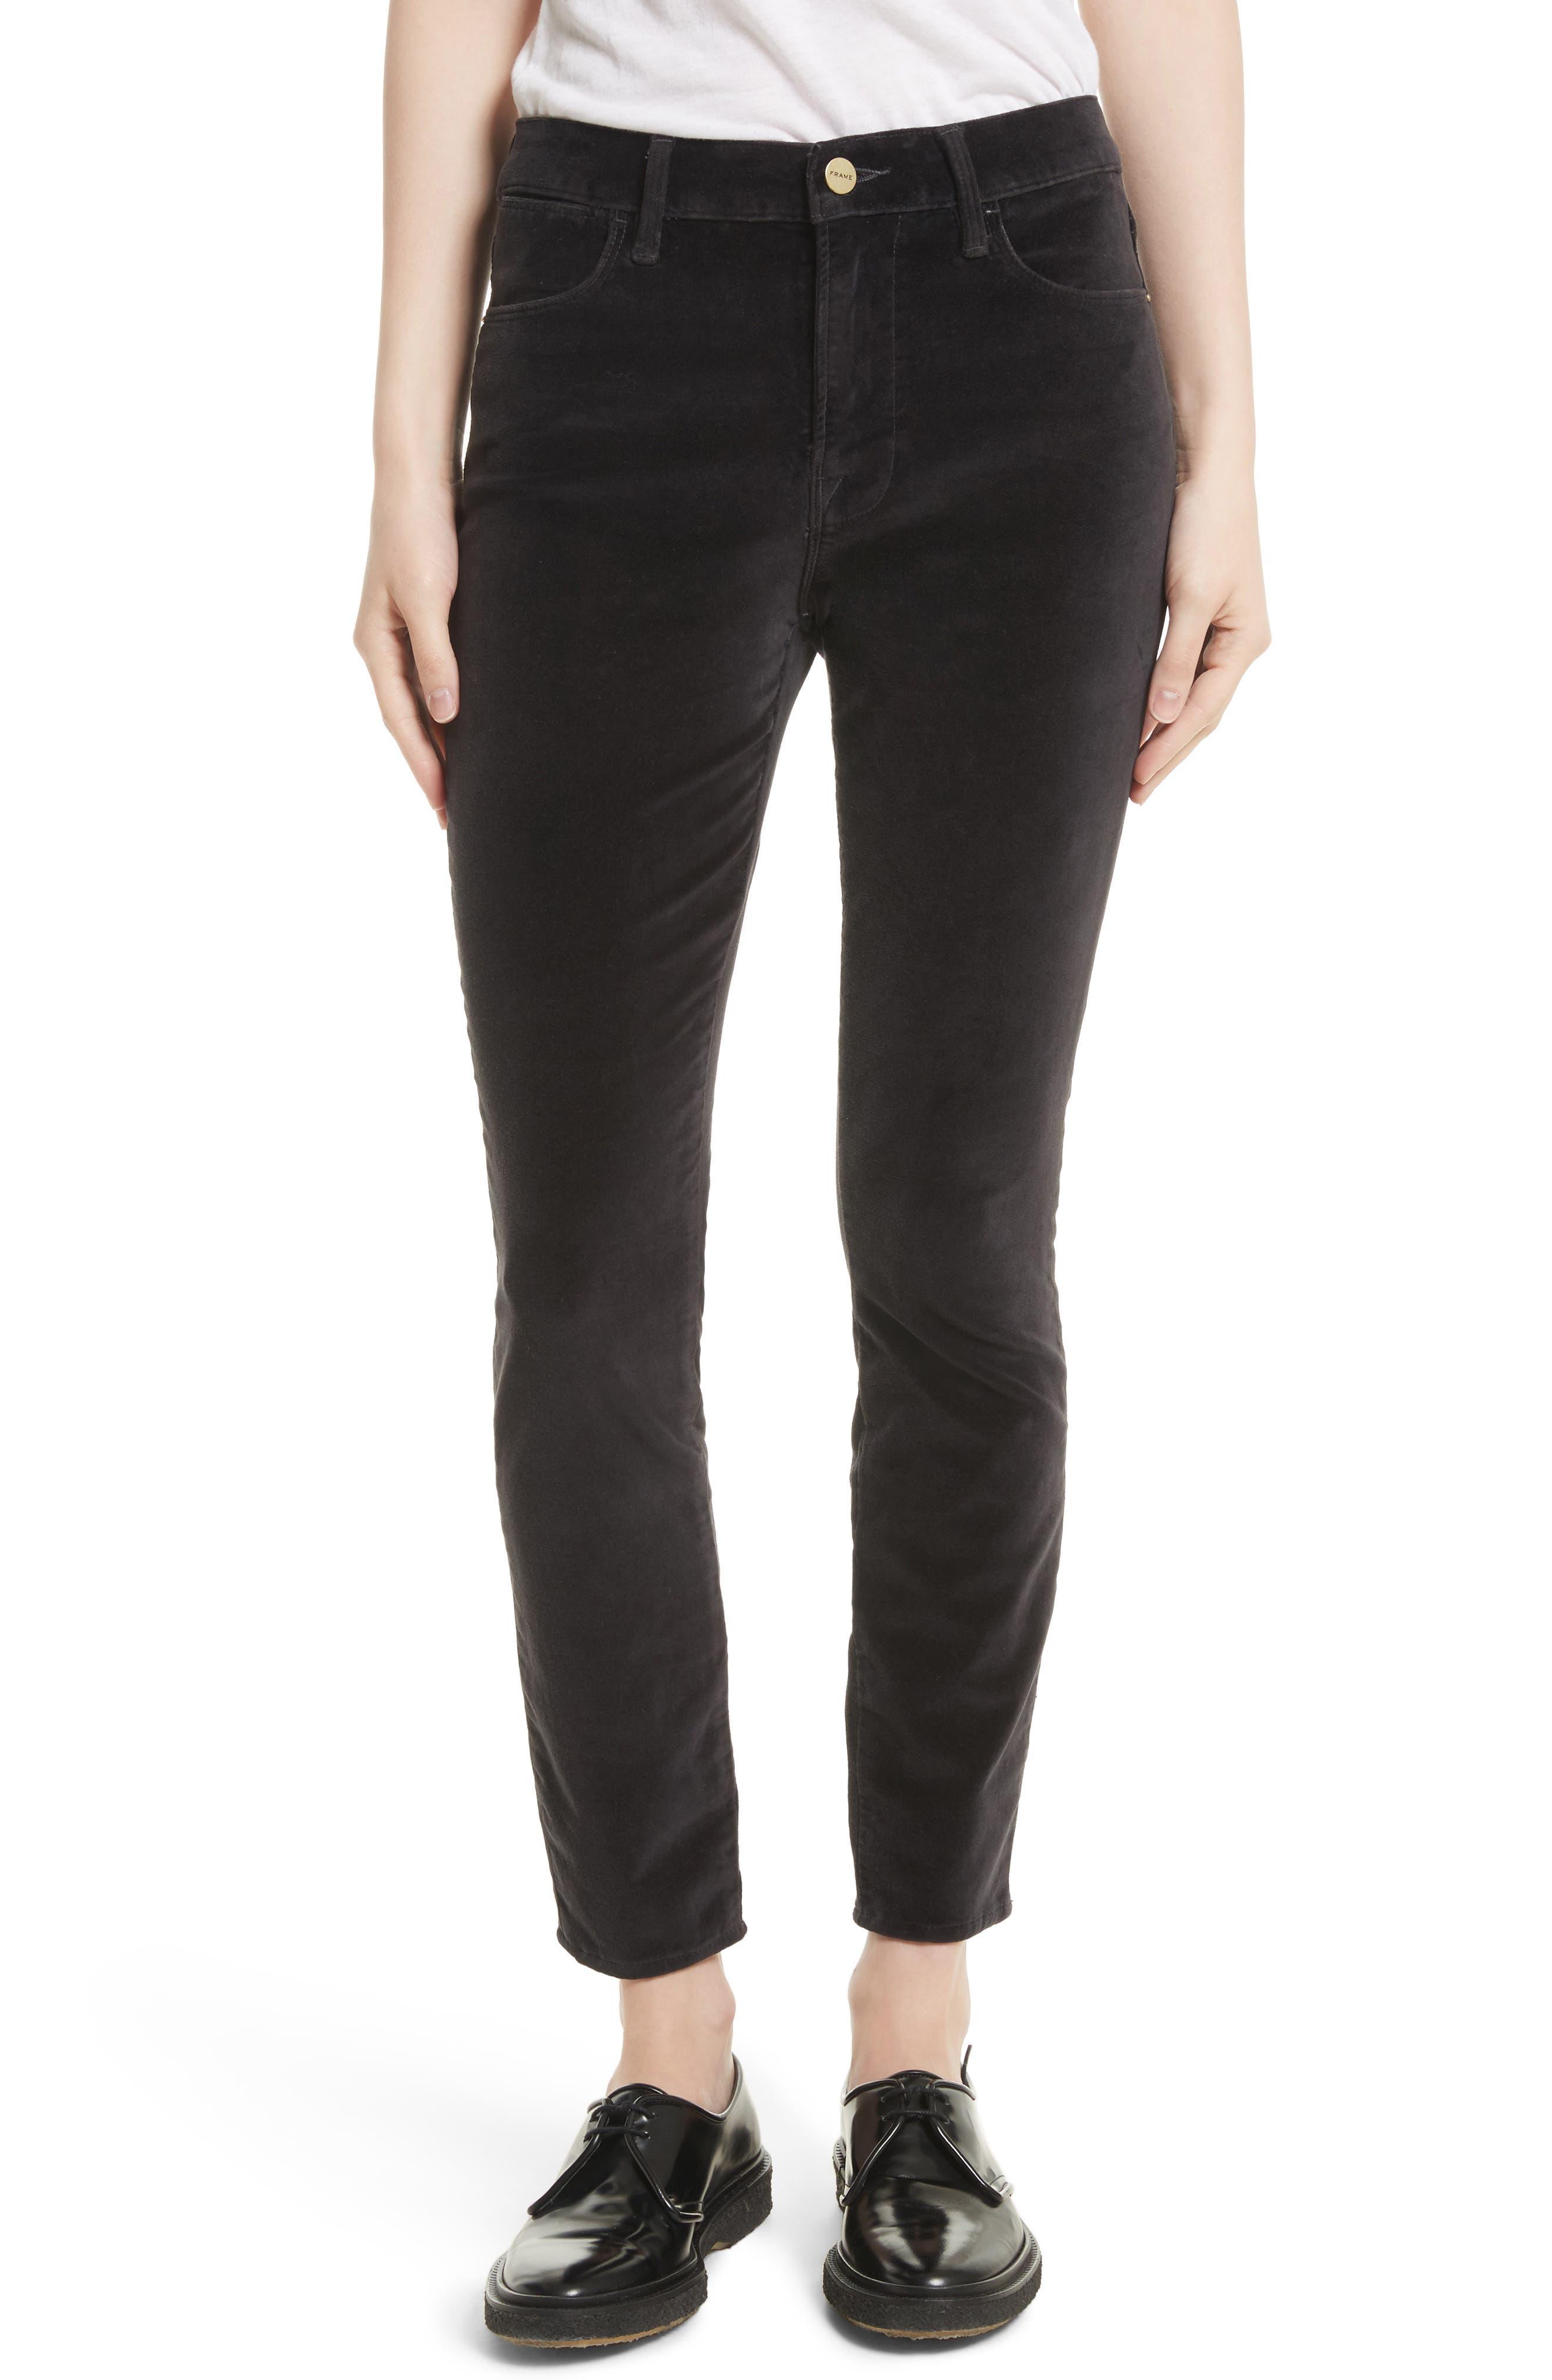 Velveteen High Waist Skinny Pants,                         Main,                         color, Charcoal